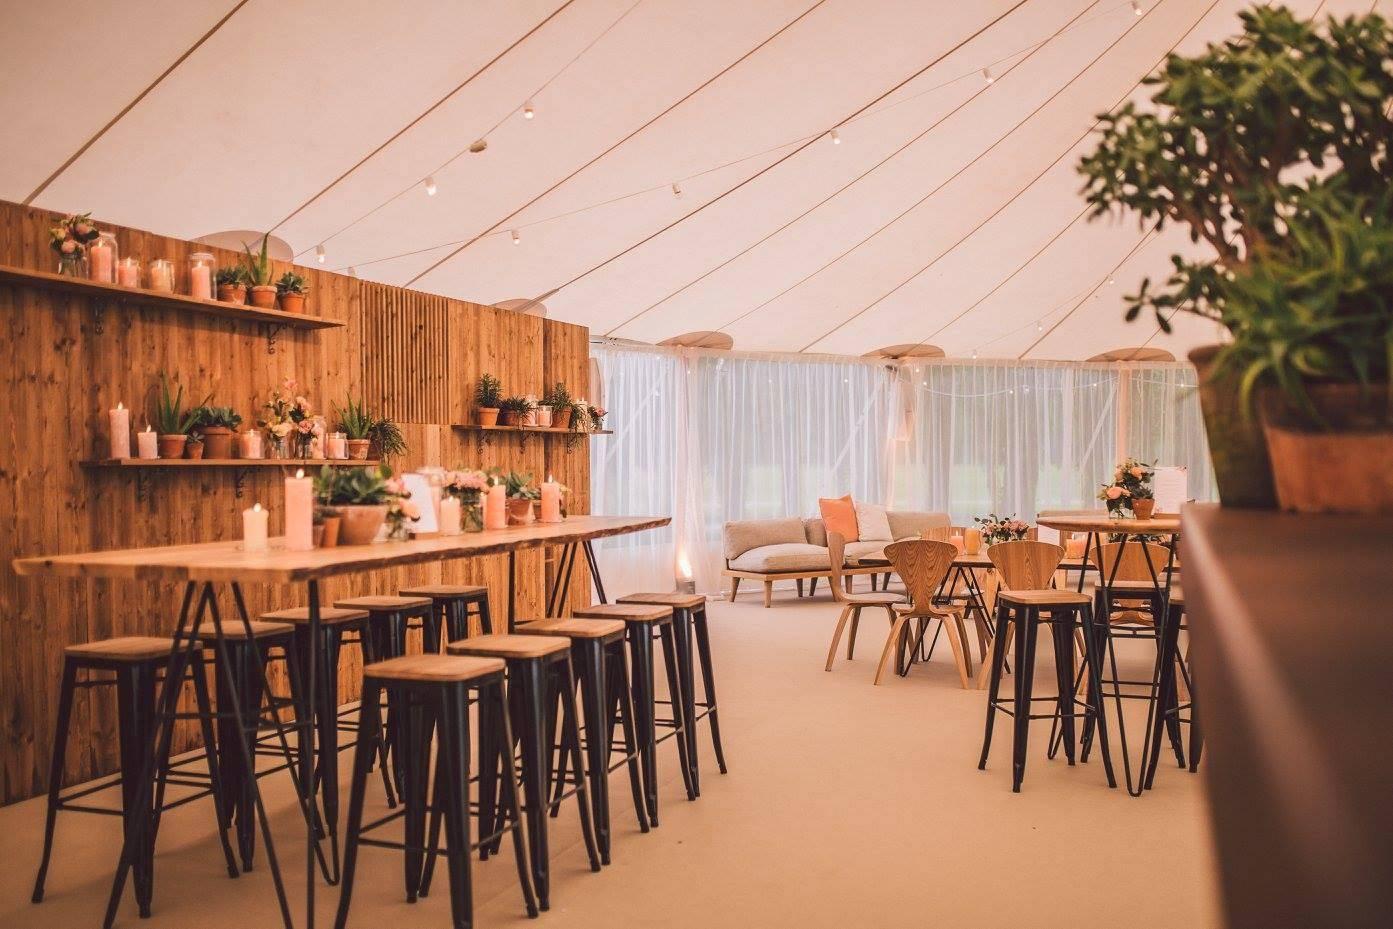 Organic-Concepts - Tenten - Feesttenten - Verhuur Tenten - Stretch tent - House of Events - 7